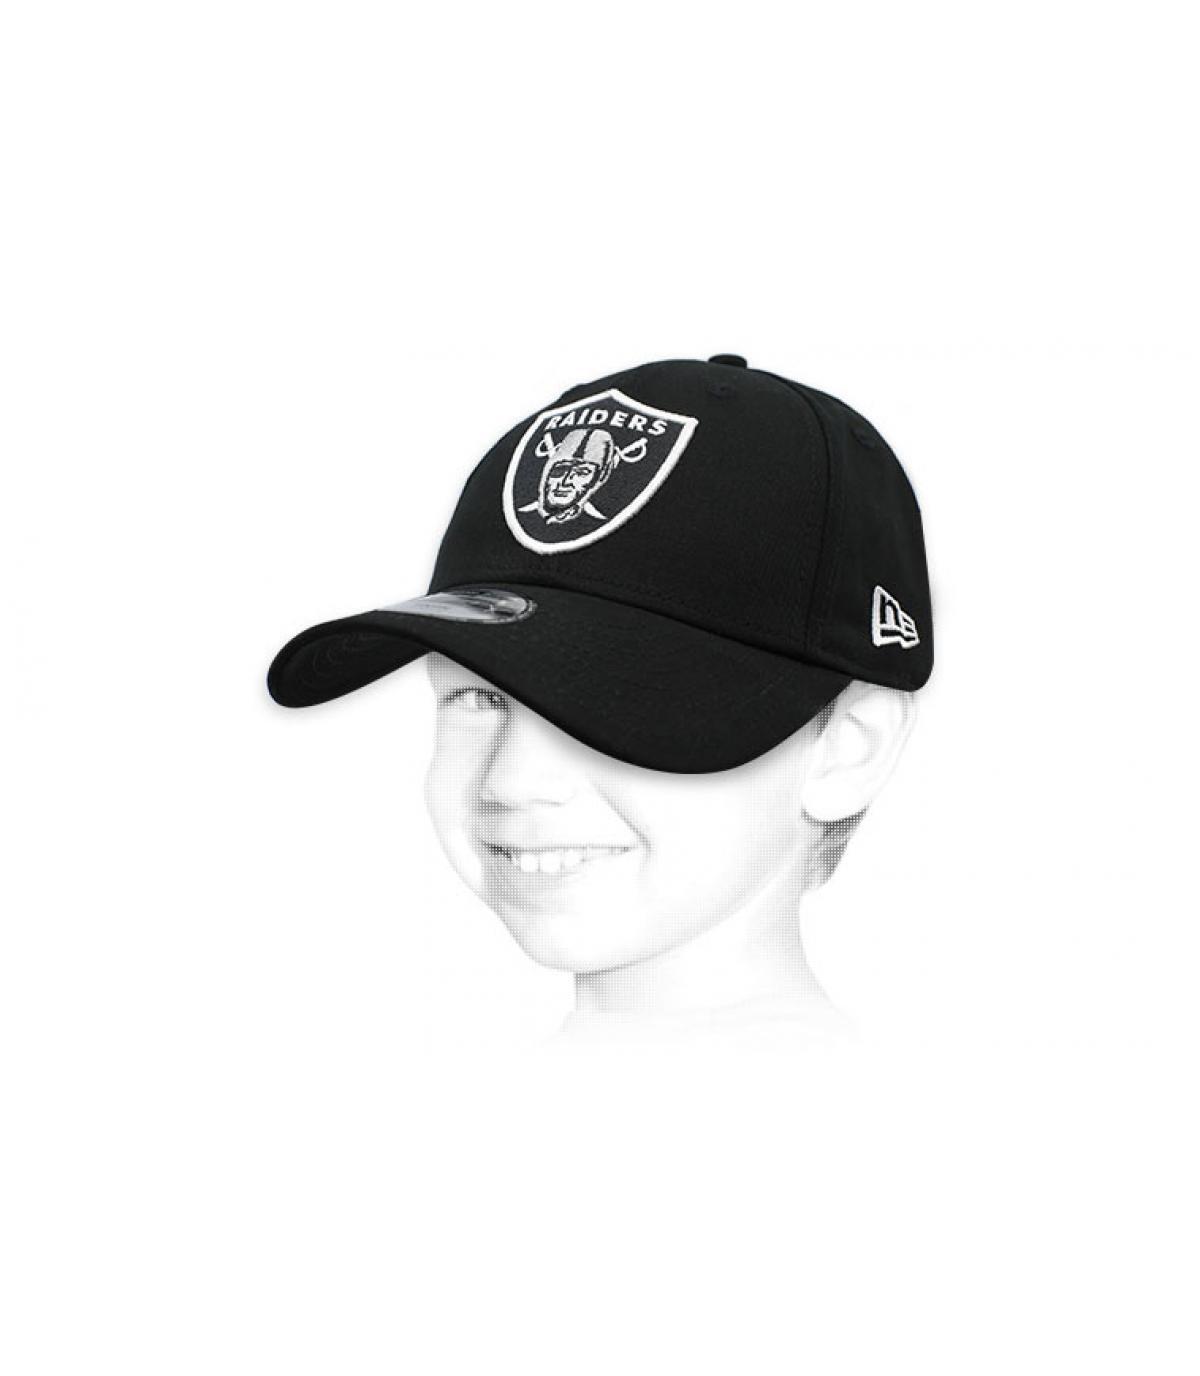 kids Raiders cap black